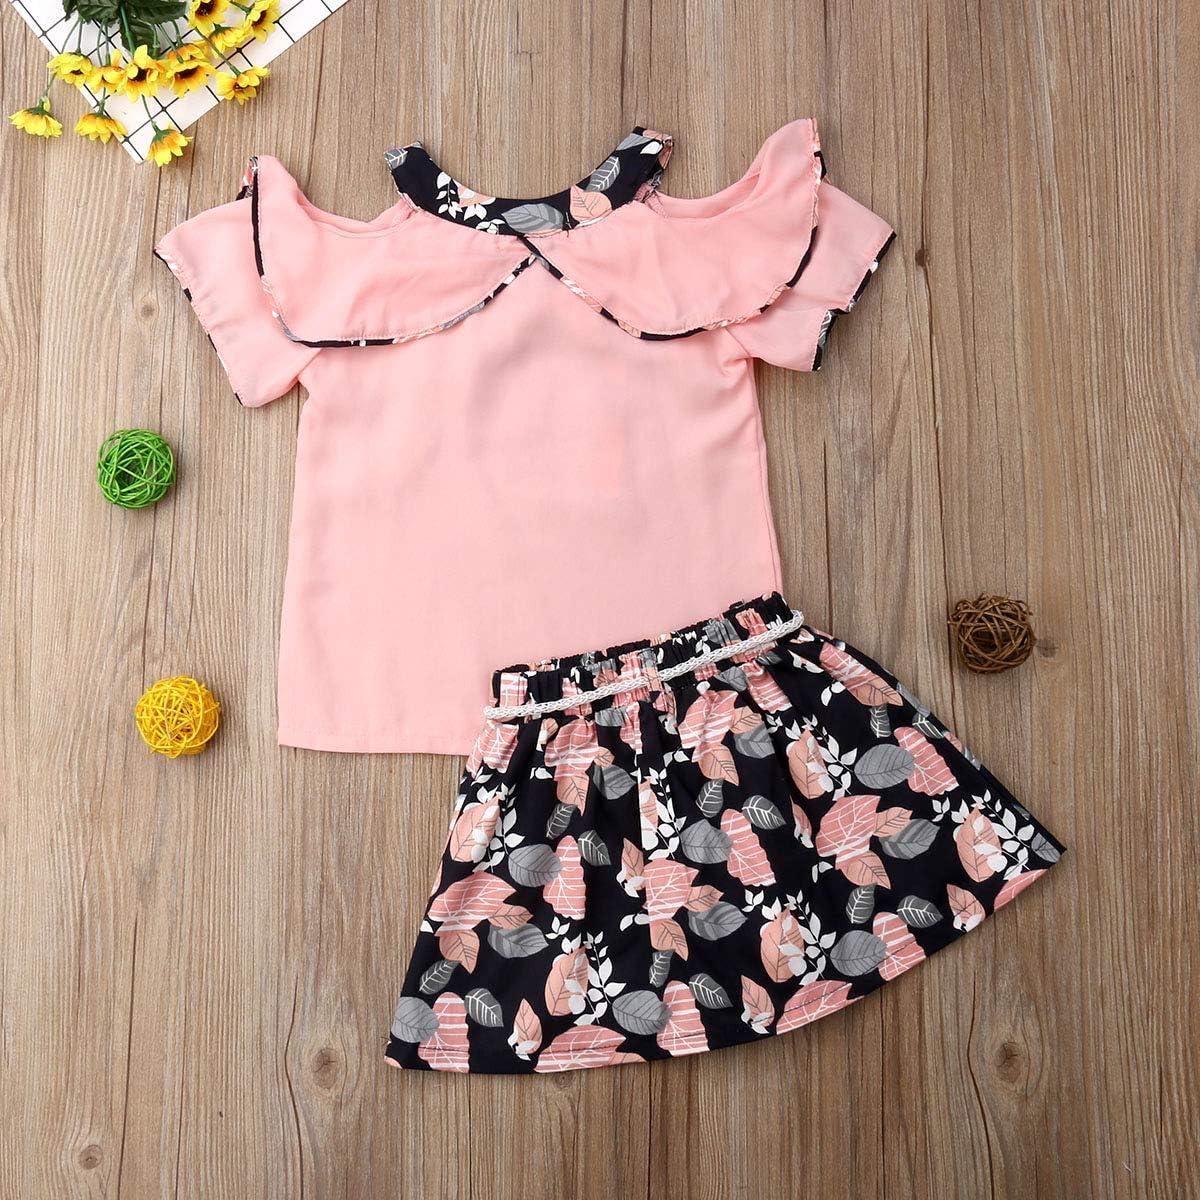 4-8 Years Little Girls Chiffon Tops Ruffle T Shirt Leaves Print Skirt with Tassel Belt 2Pcs Summer Outfit Sets